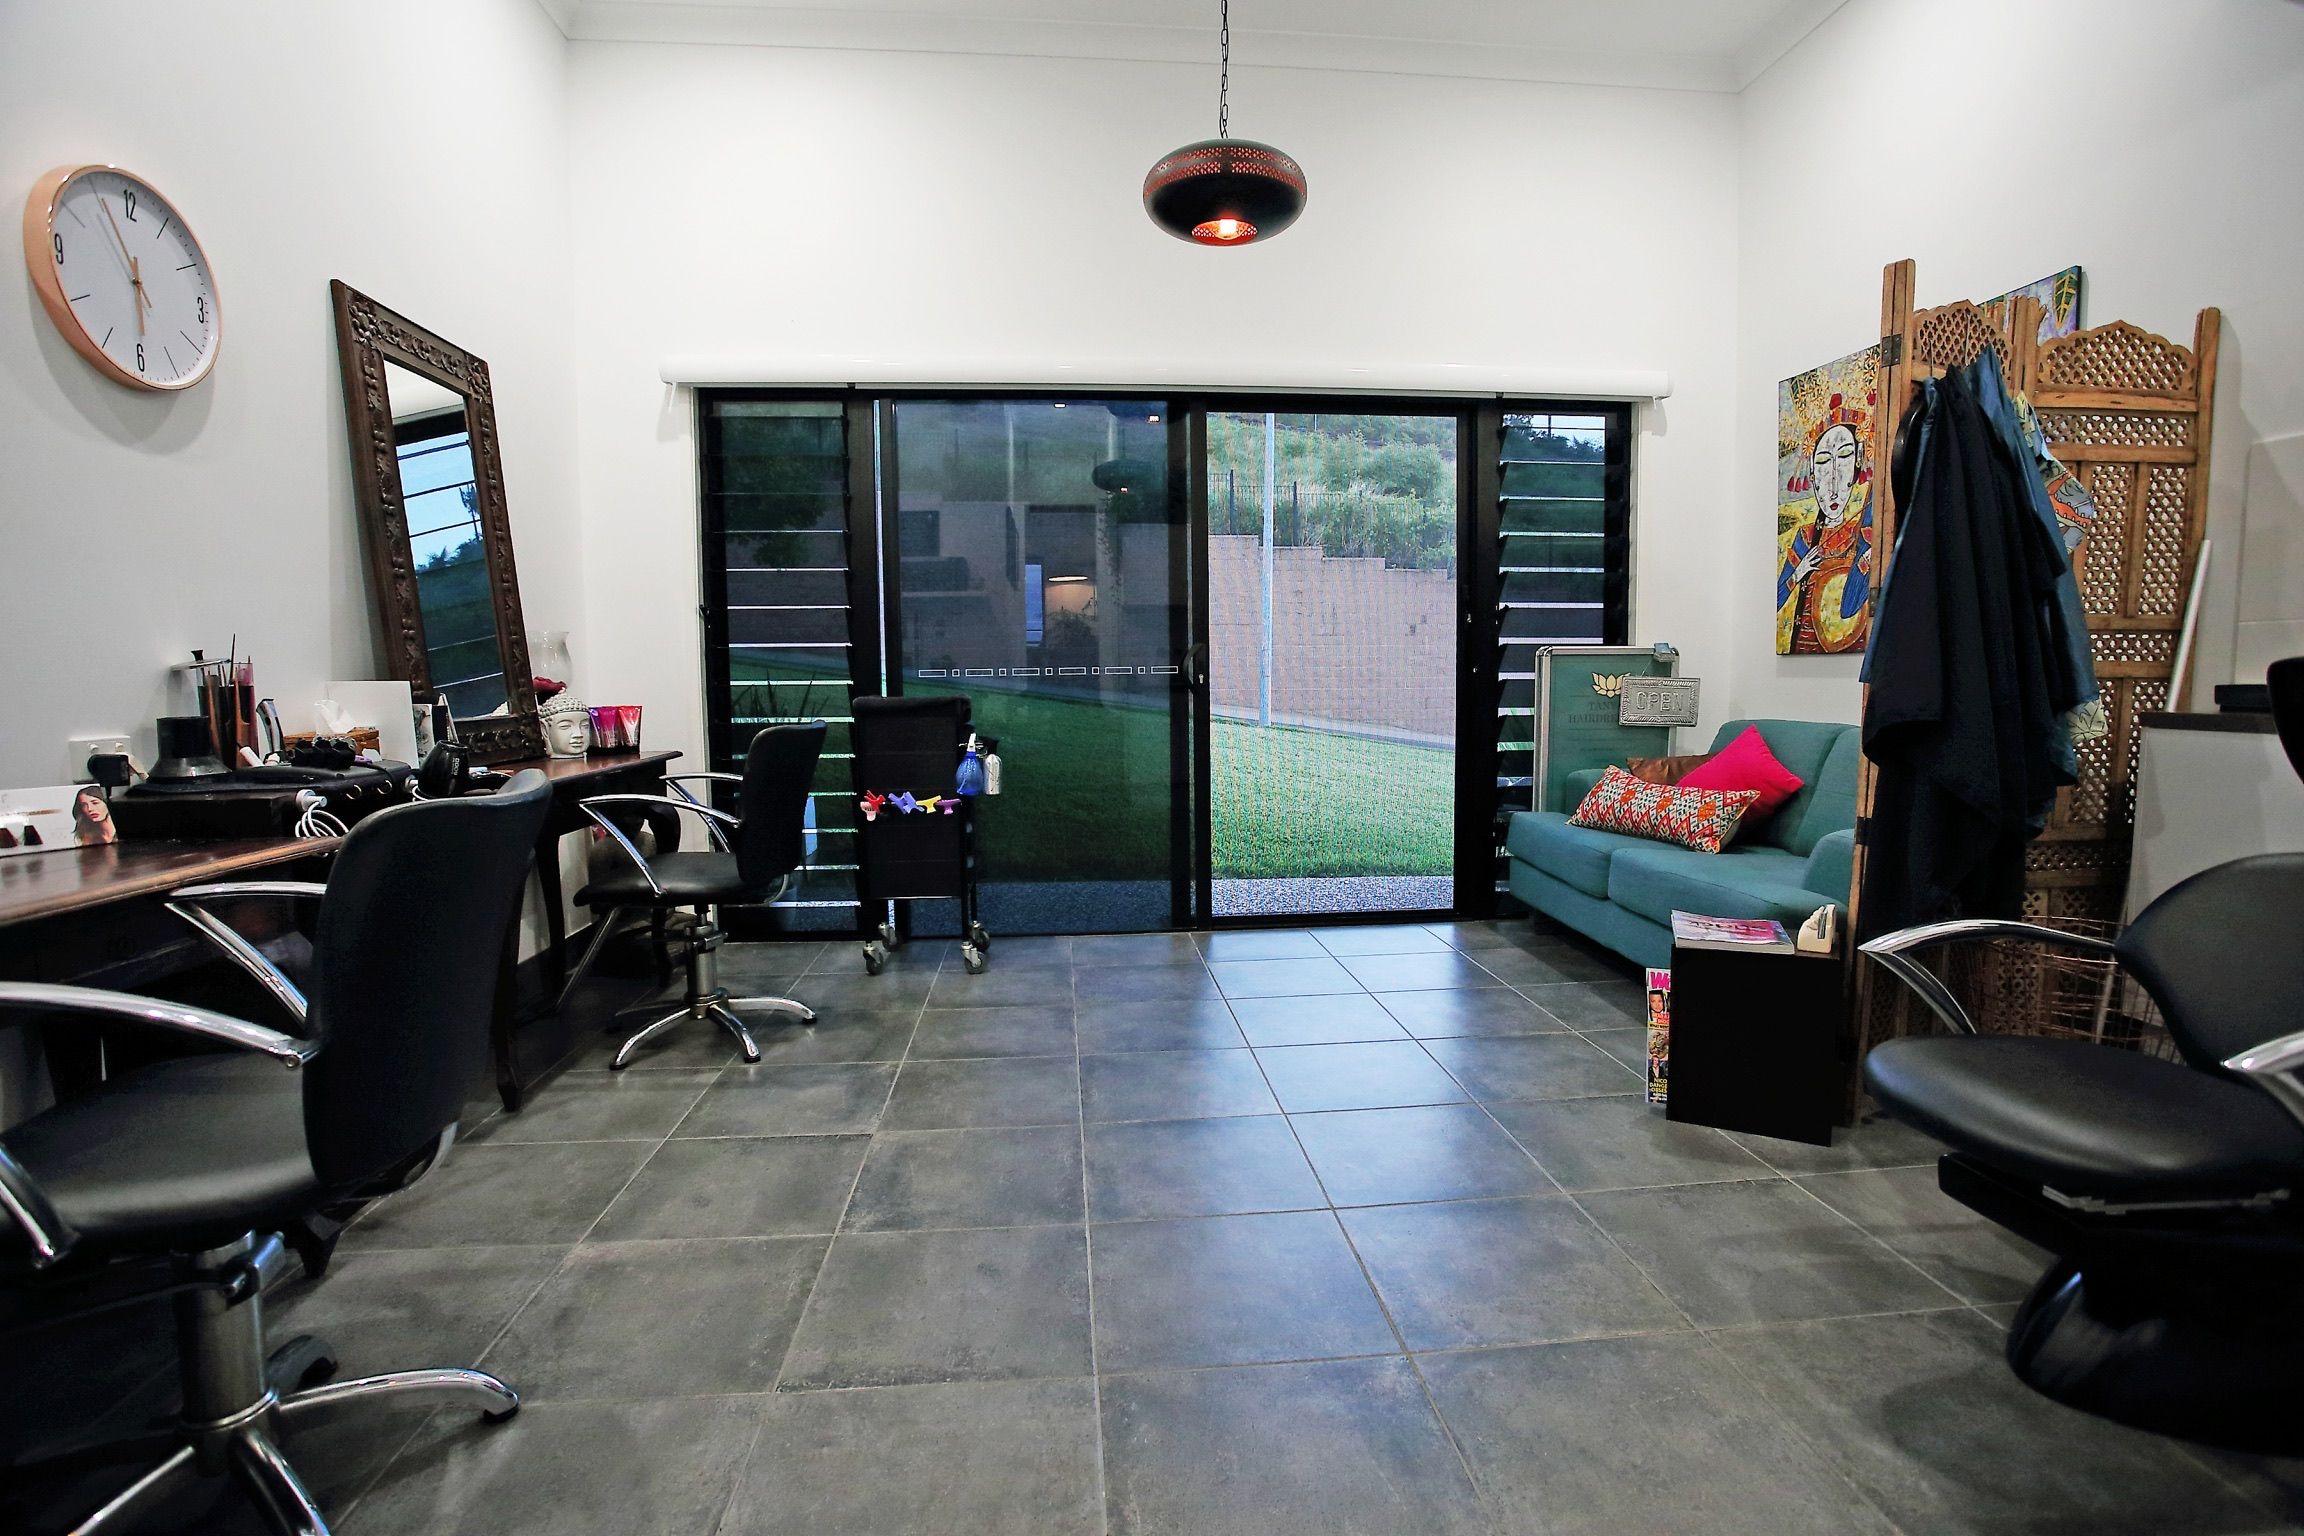 Home Based Hair salon  Home, Home decor, New homes